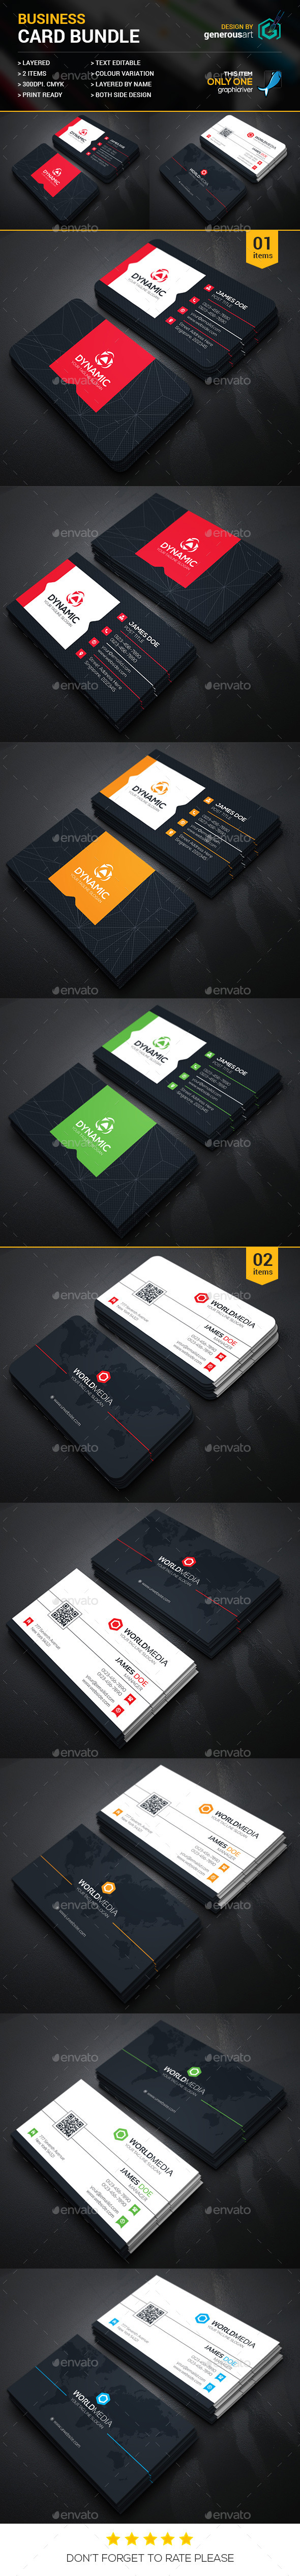 Business Card Bundle 2 in 1 Vol 13